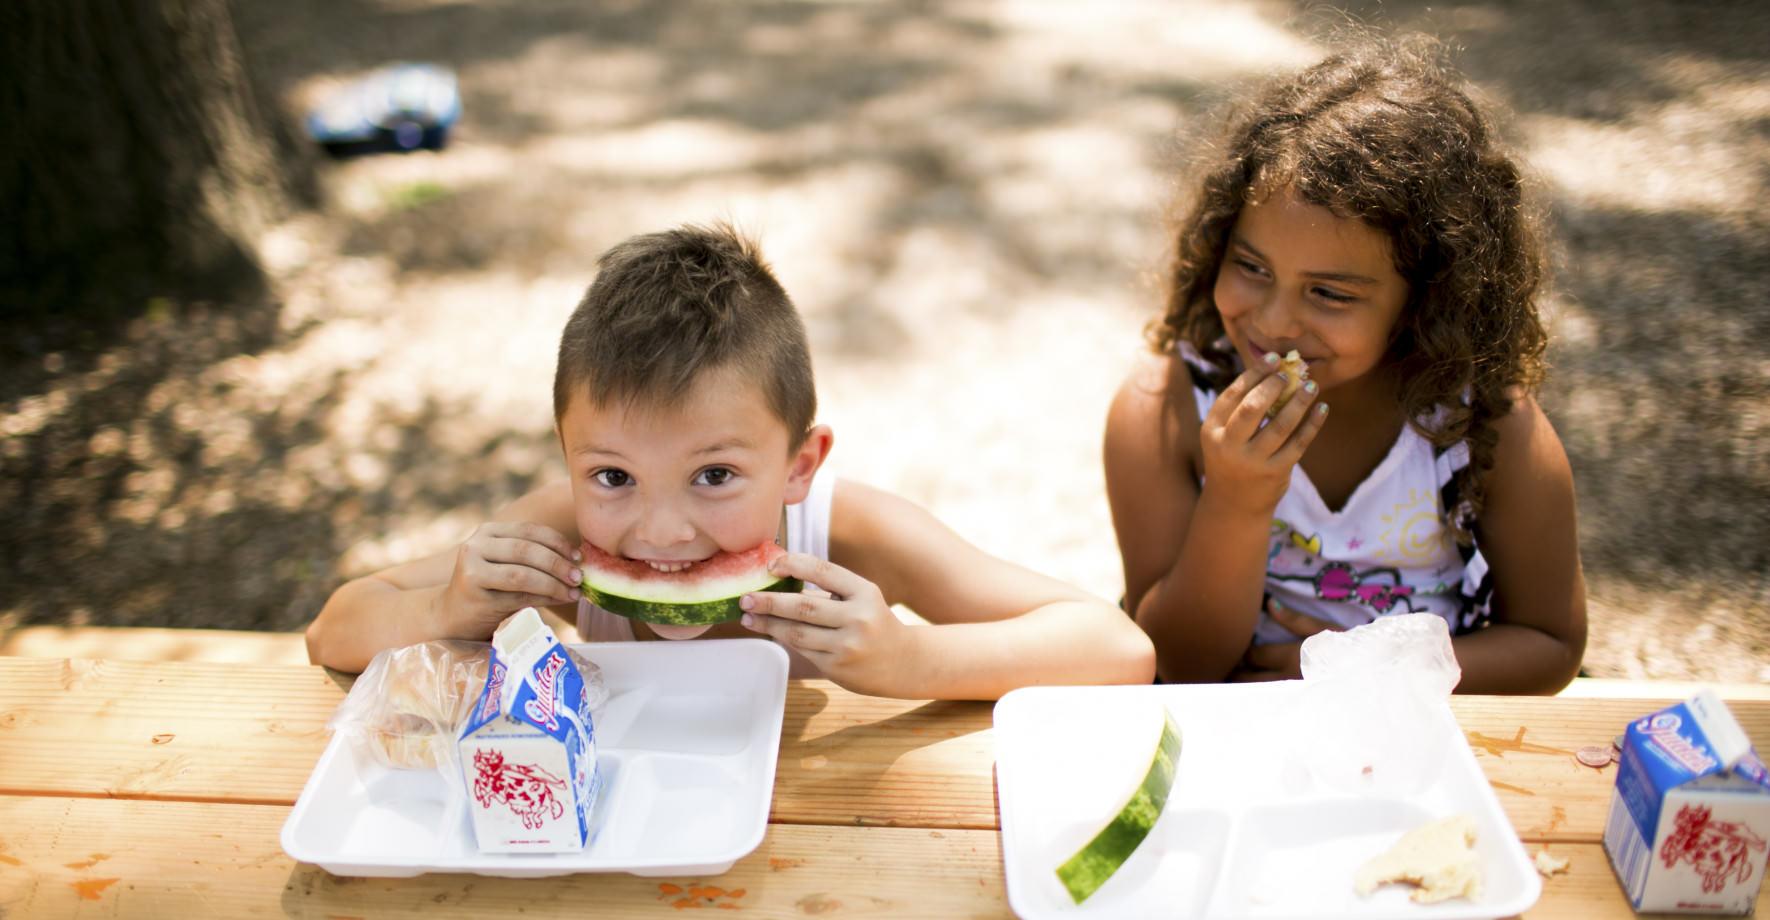 Boy and Girl Eating Watermelon at Picnic Table